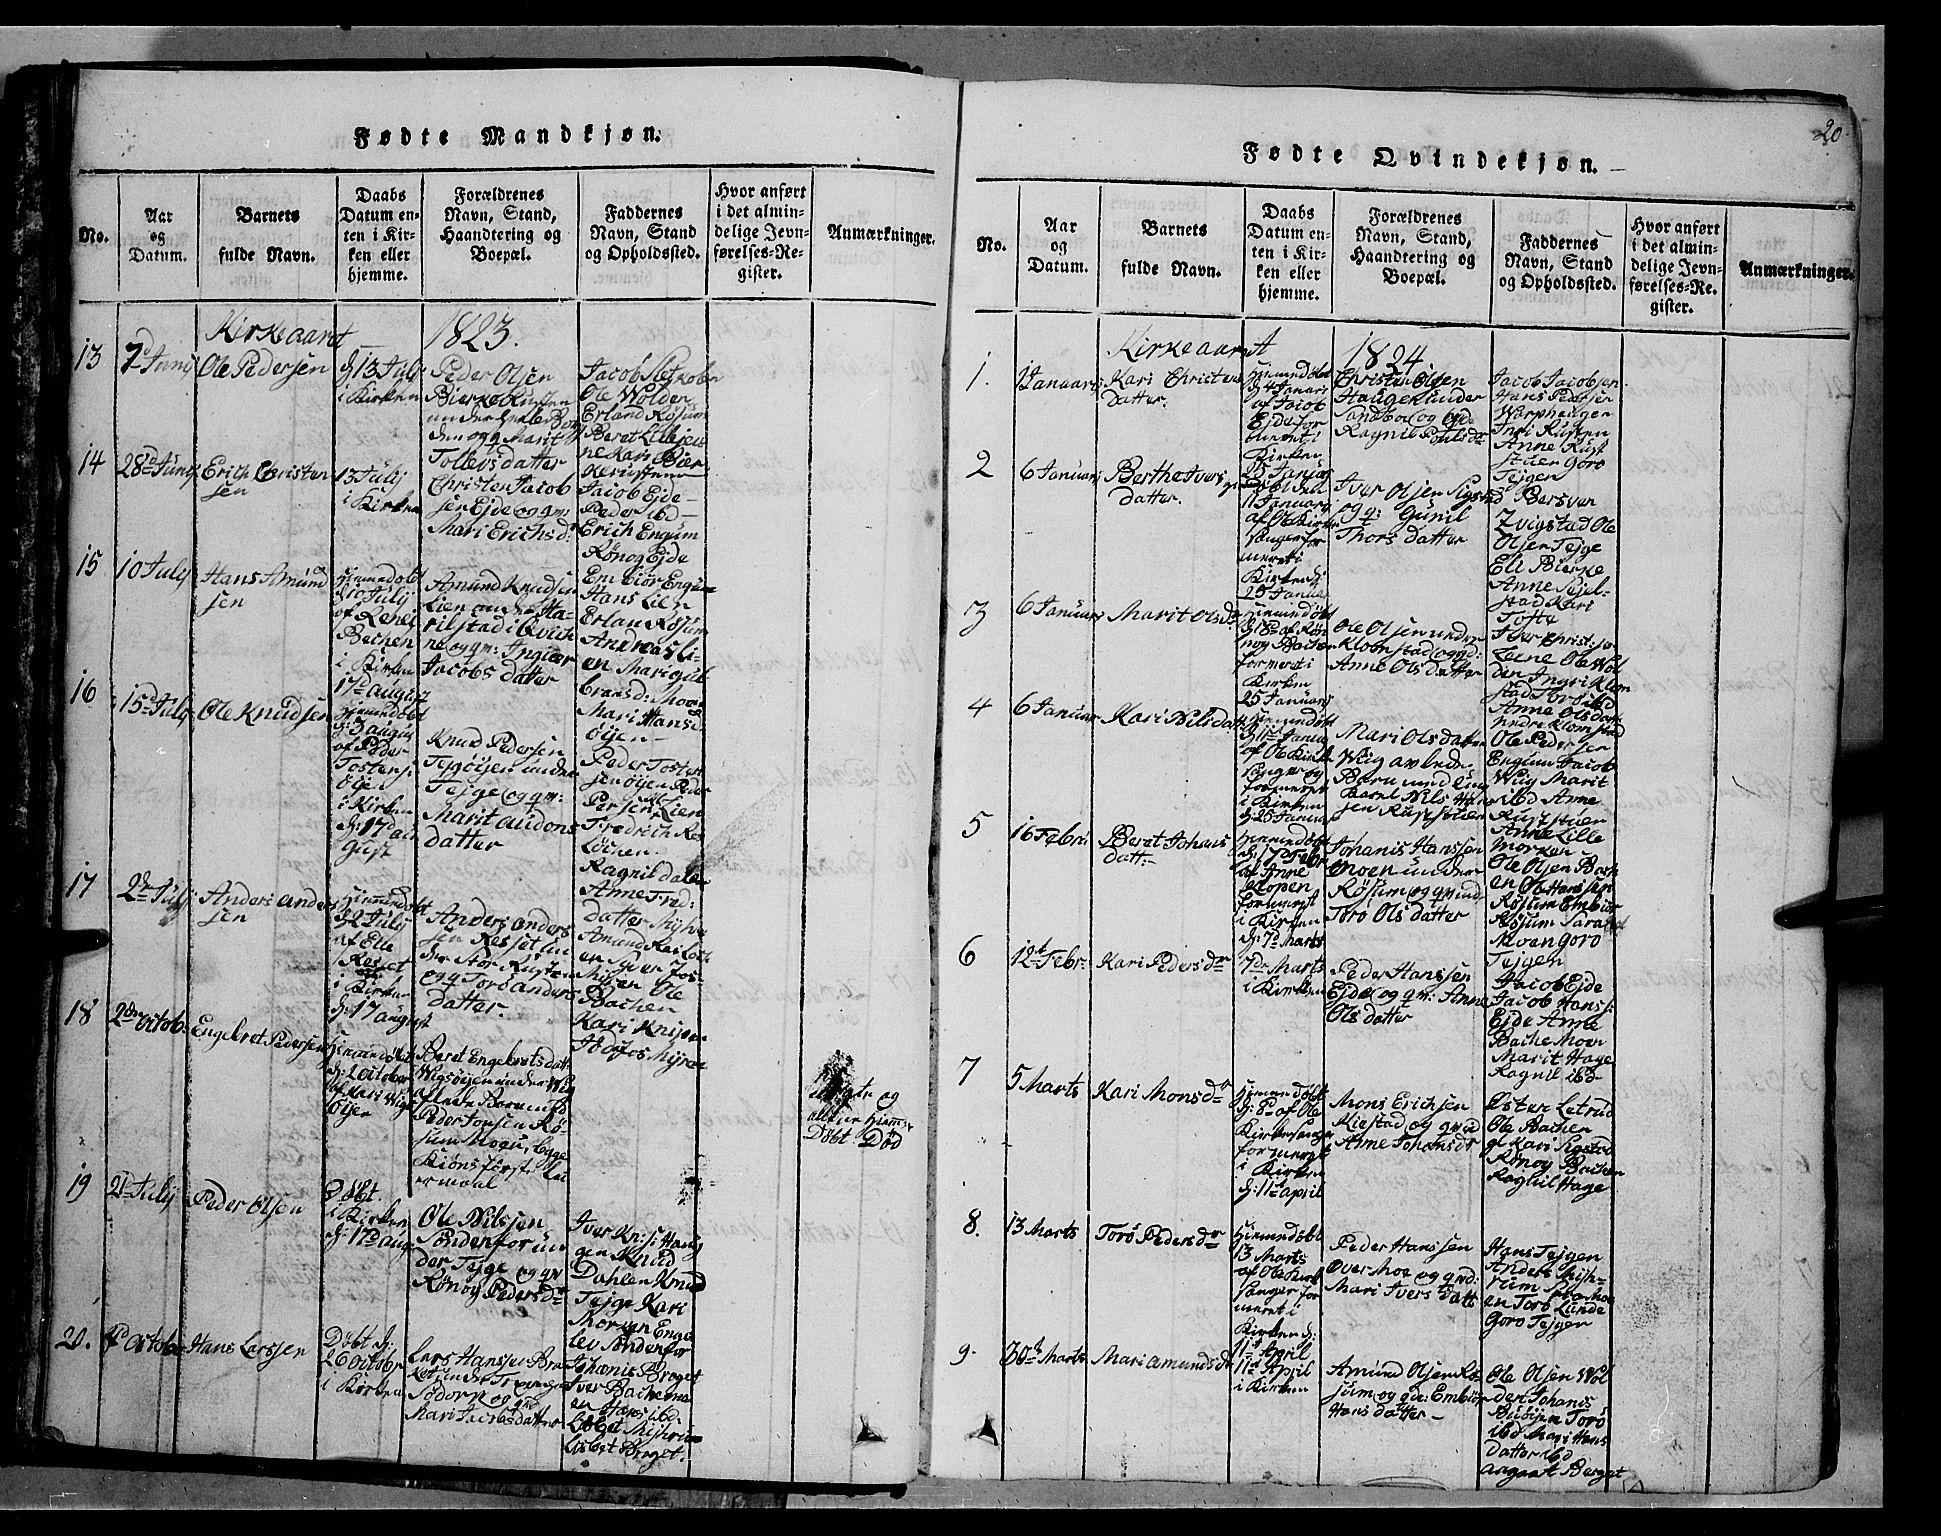 SAH, Fron prestekontor, H/Ha/Hab/L0002: Klokkerbok nr. 2, 1816-1850, s. 20